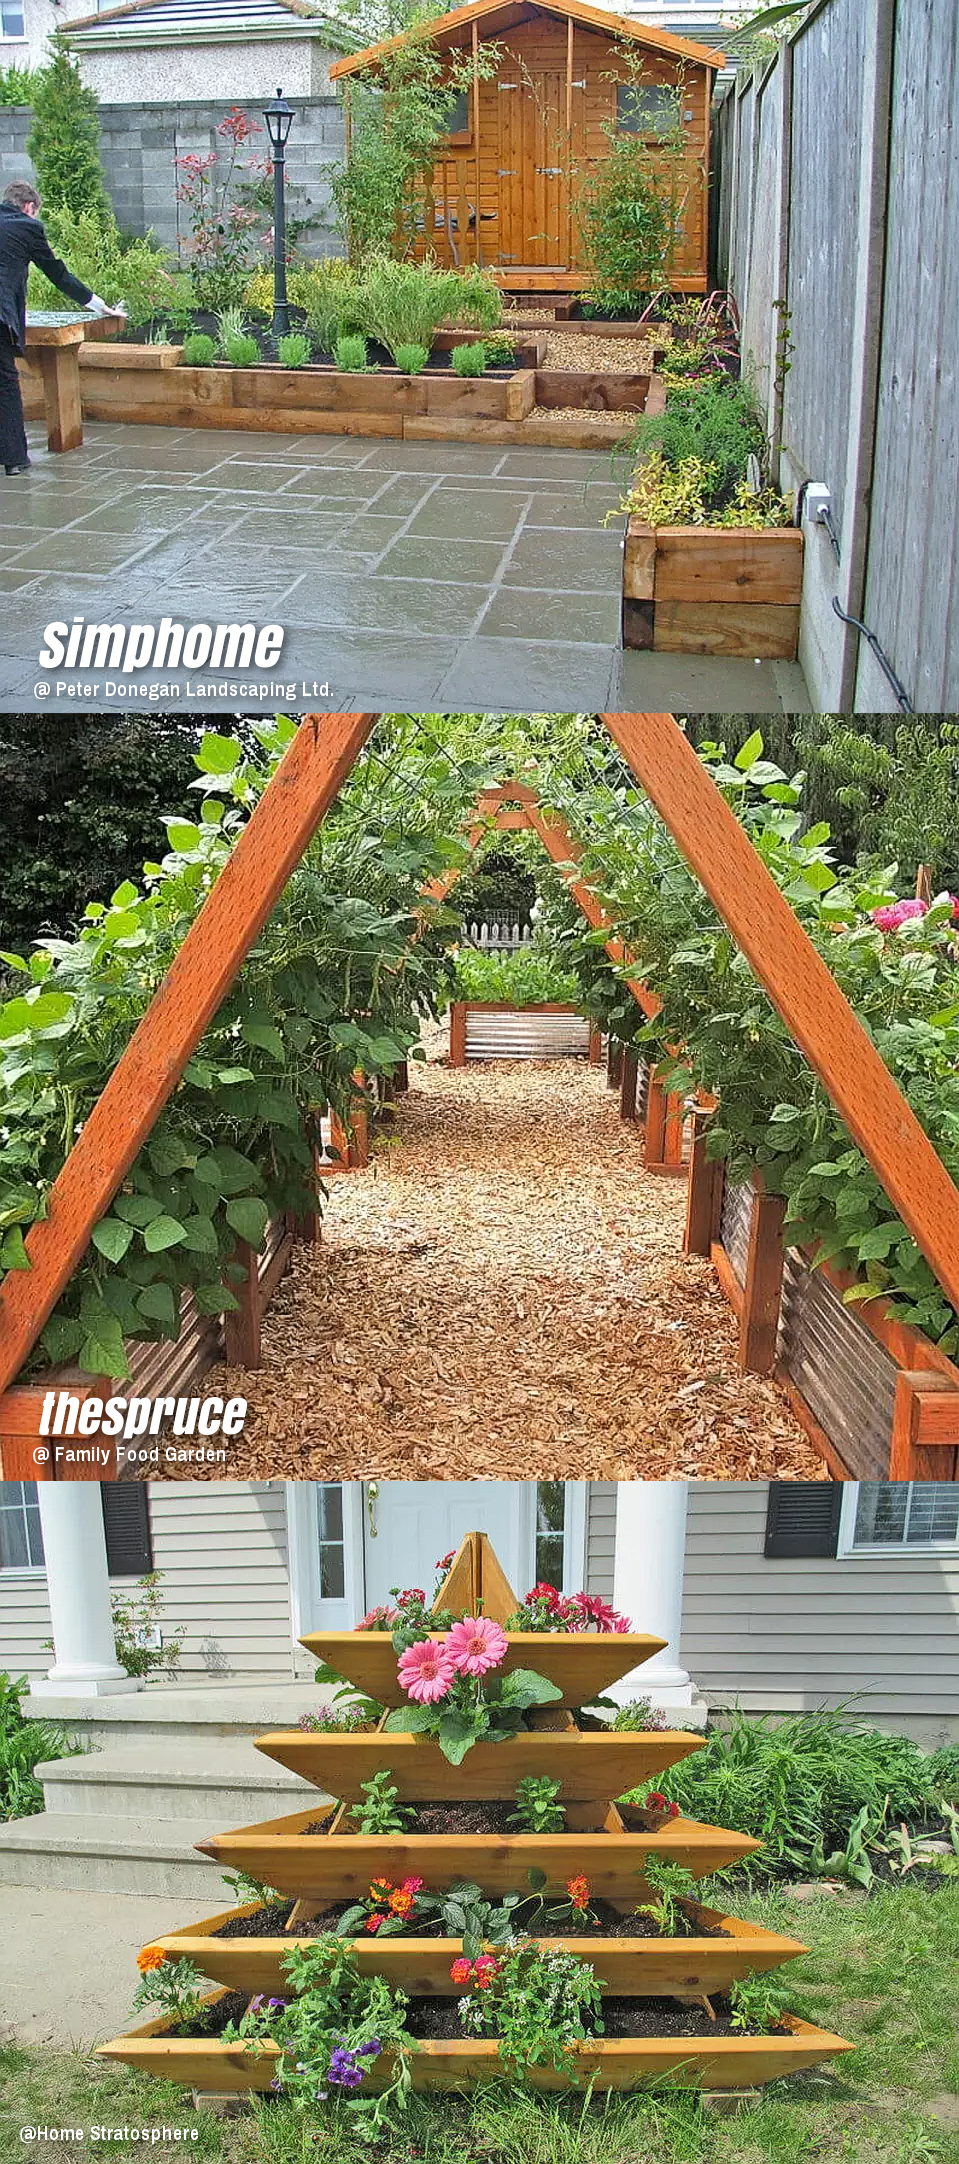 7 Raised Bed Gardening via simphome